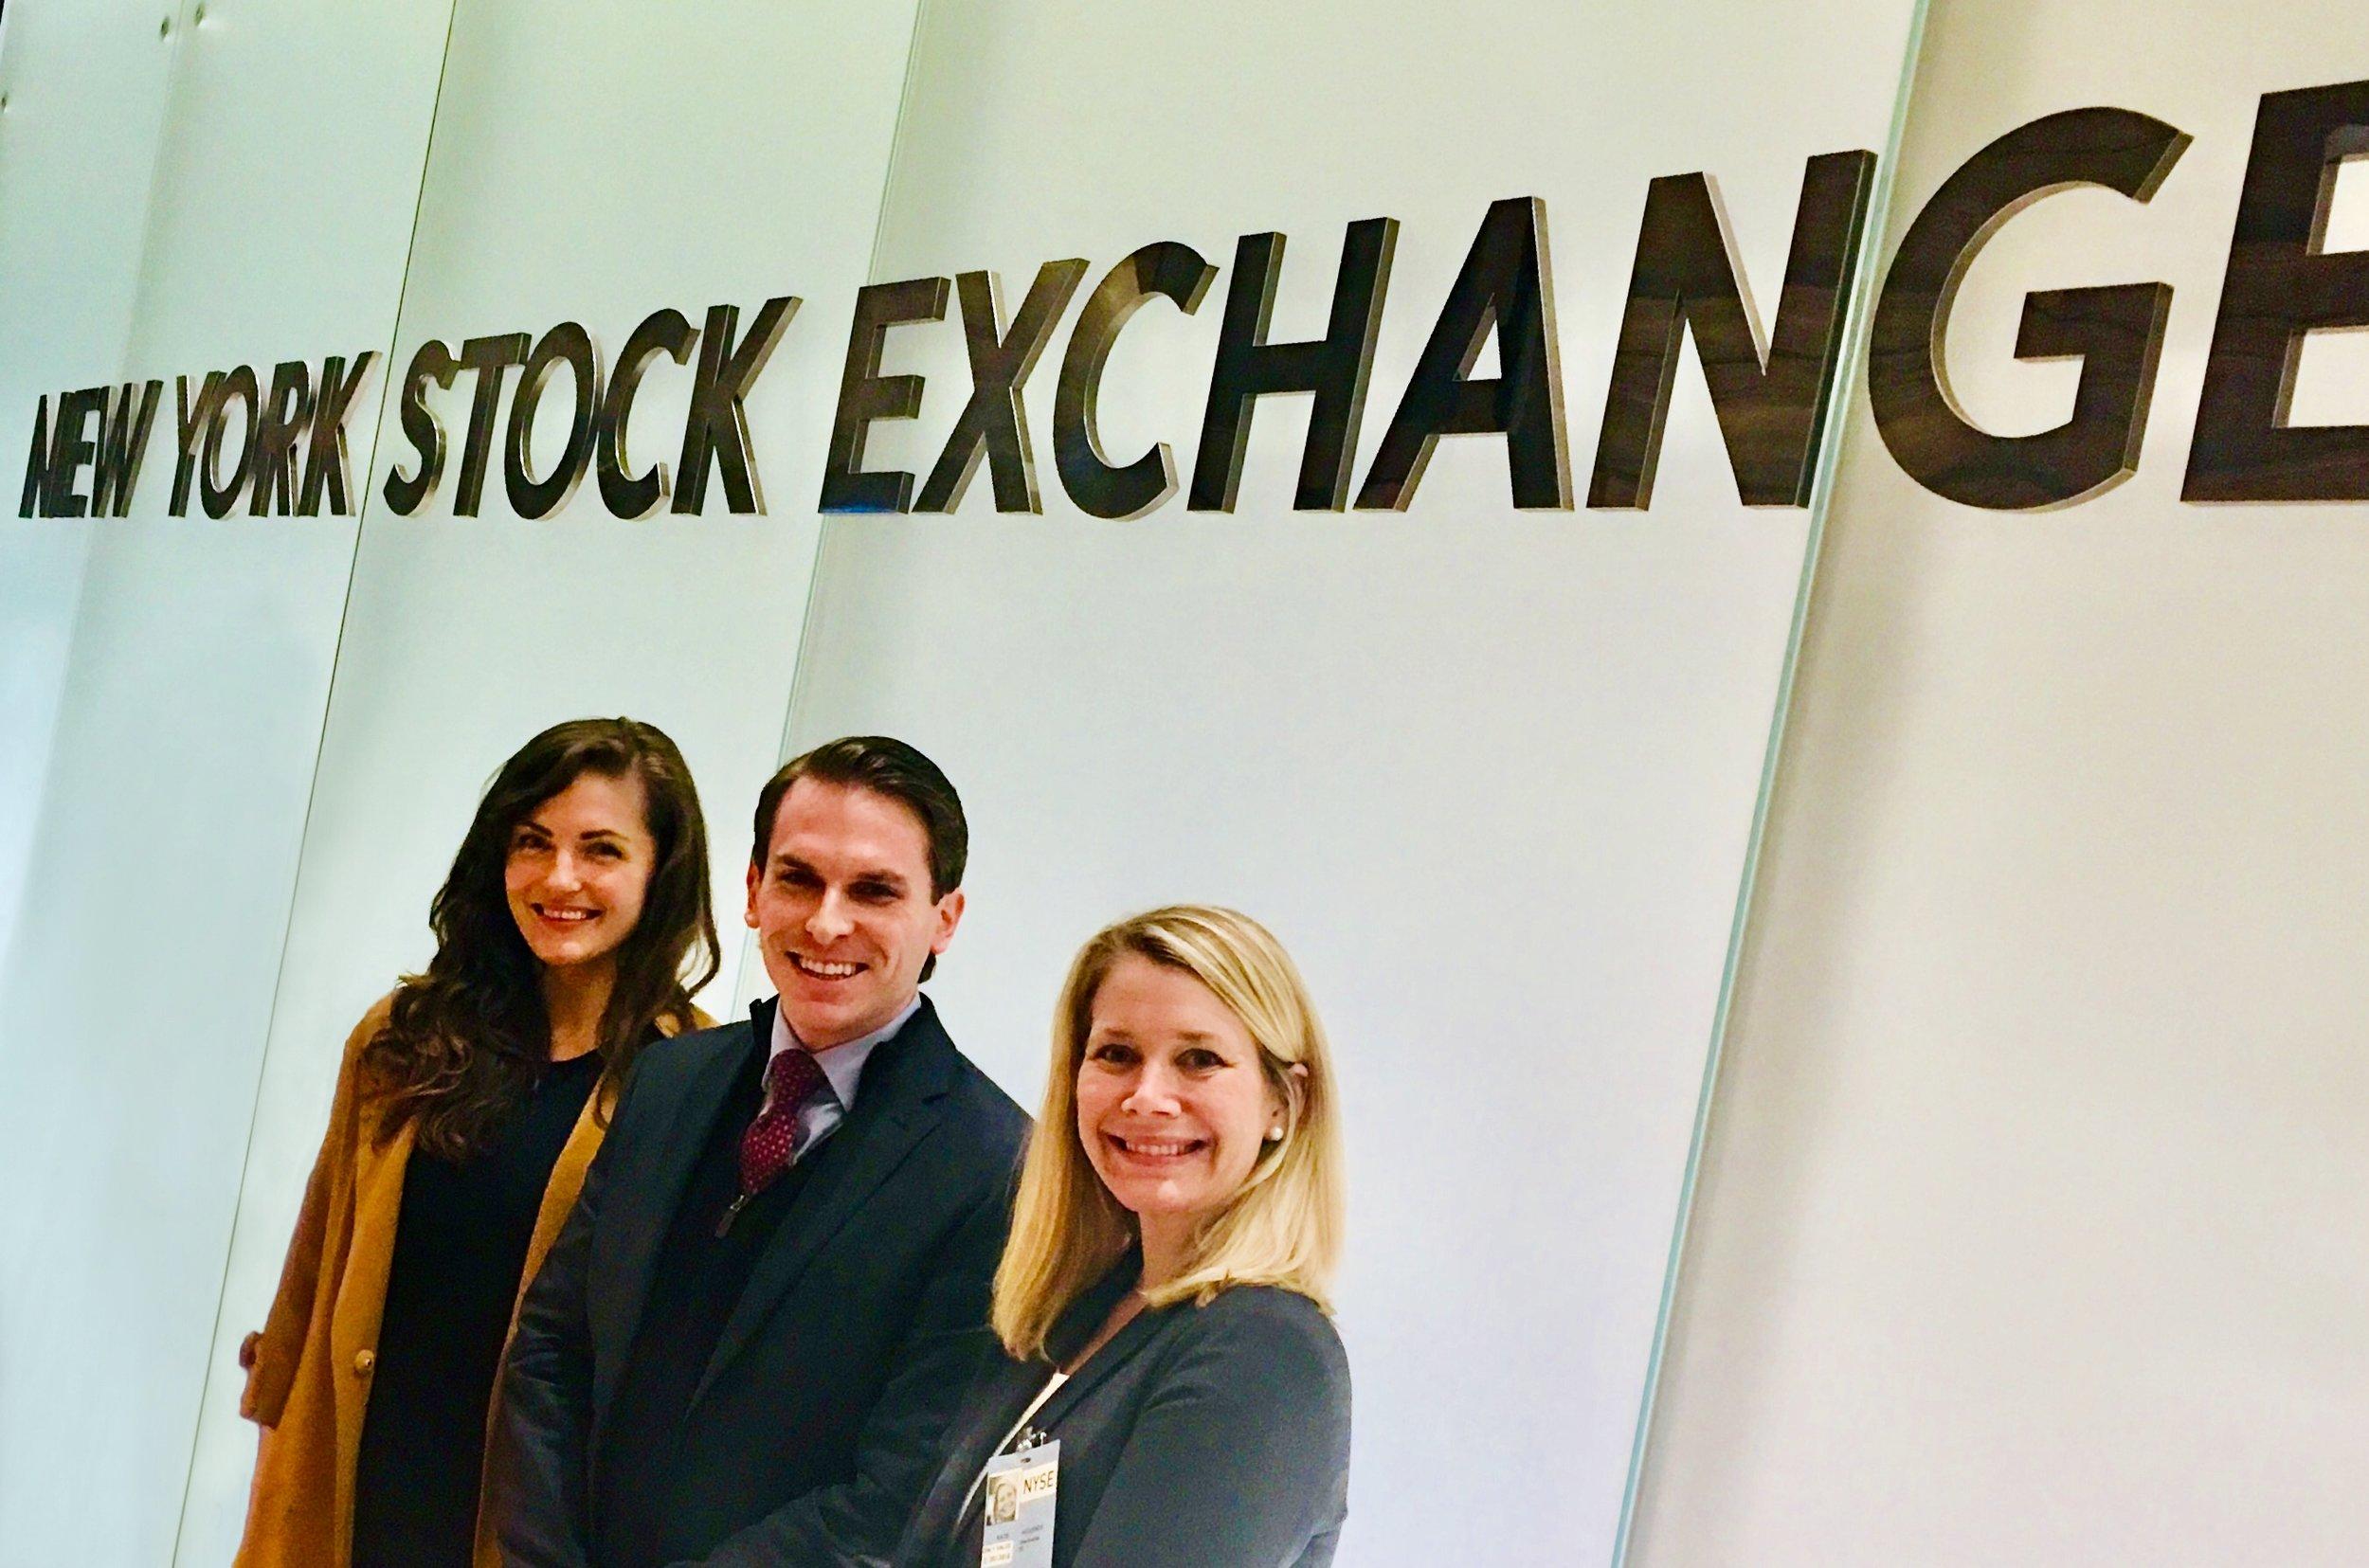 SourceFunding FundingNavigator wmichael short FinTech NYC Community Banks New York Stock Exchange.JPG